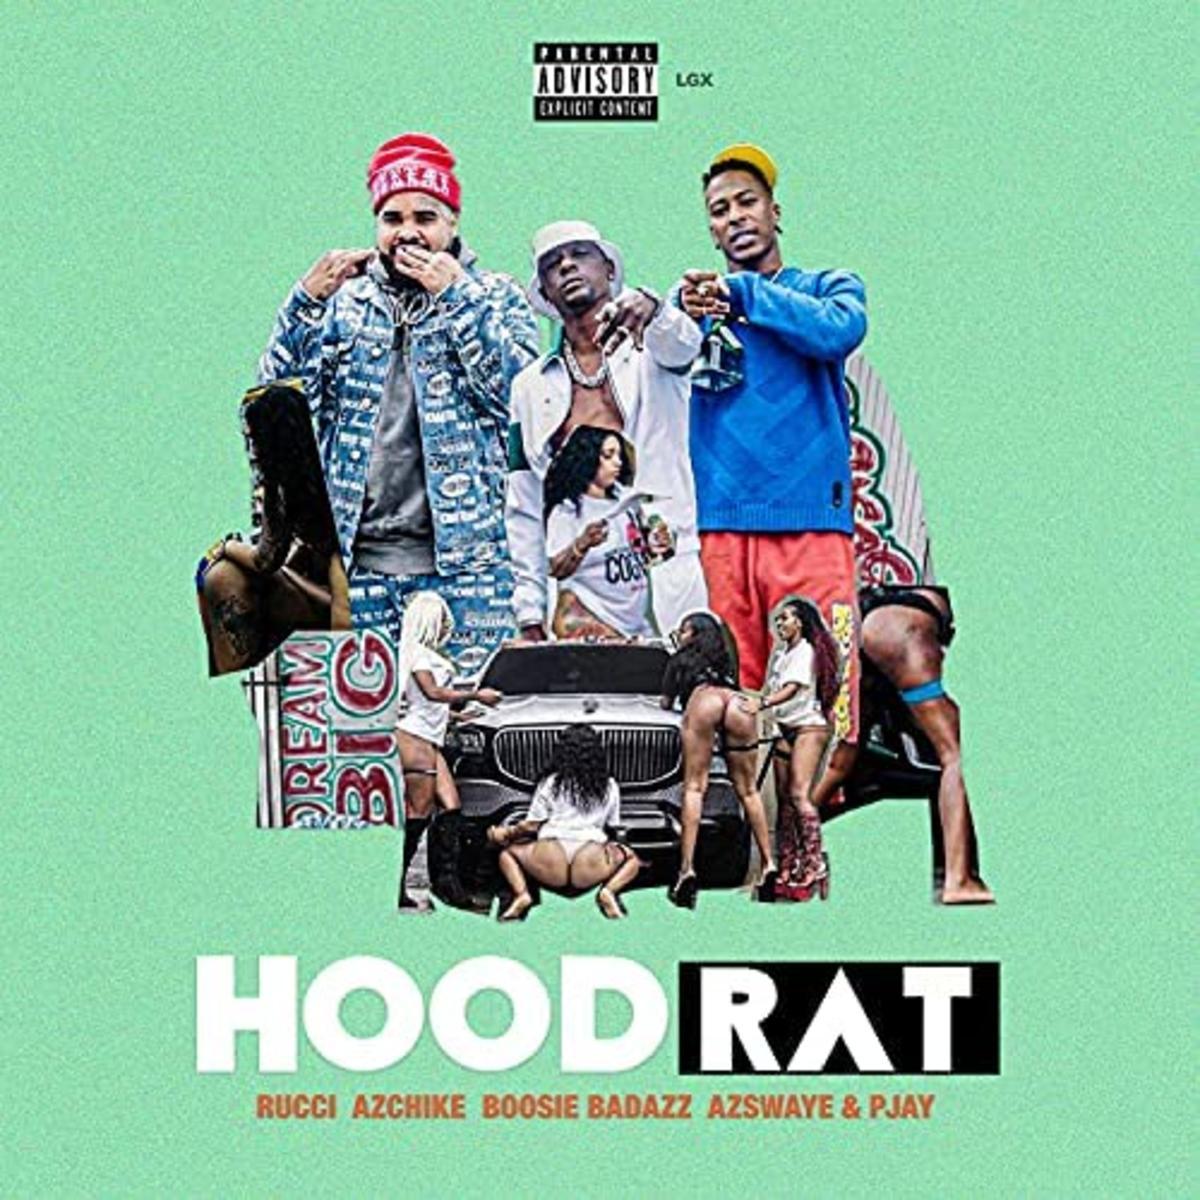 Rucci, Az Chike & Boosie Badazz Feat. AzSwaye & Pjay - Hoodrat Mp3